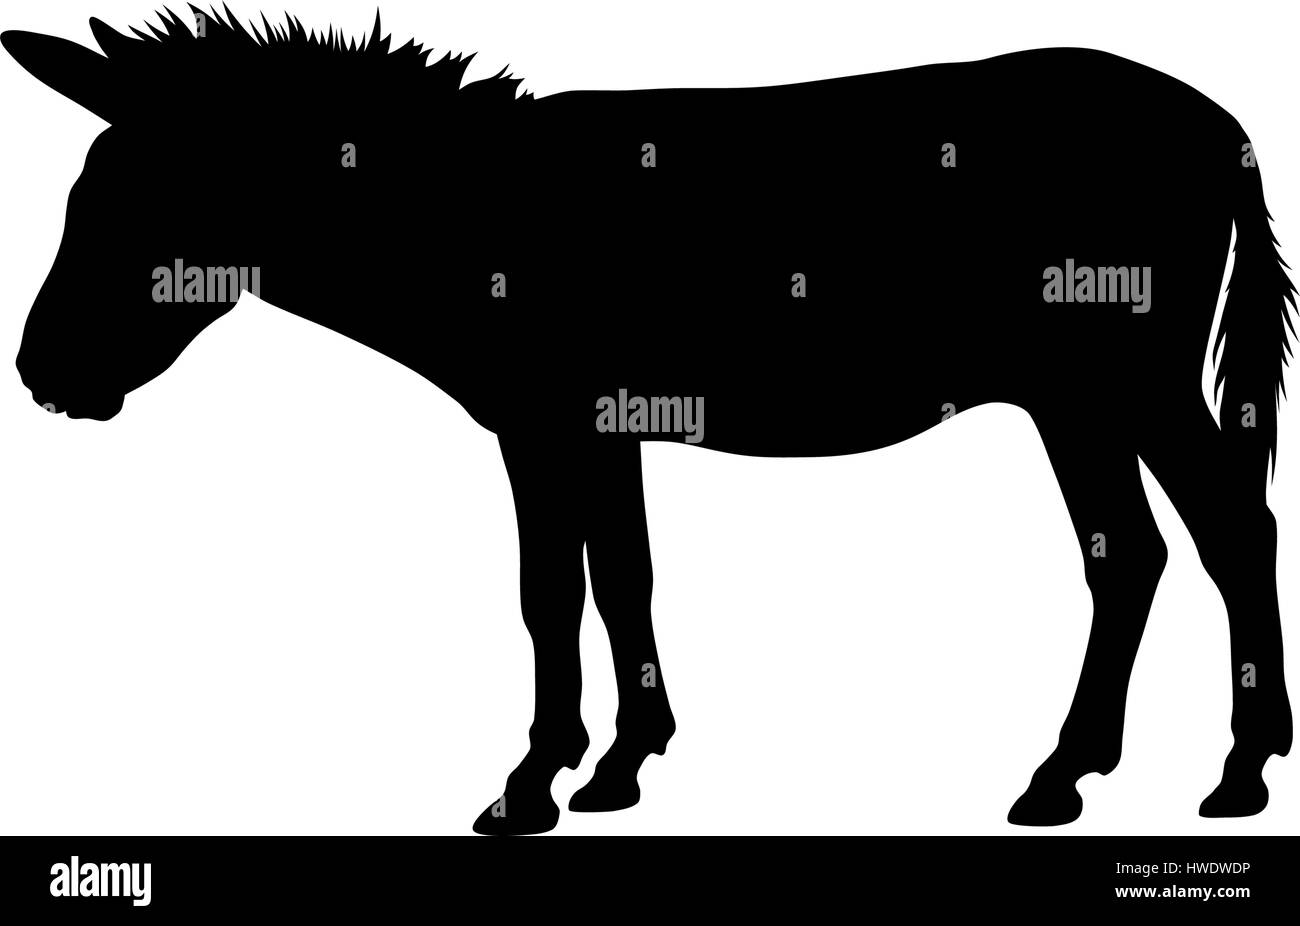 Vector illustration of donkey silhouette - Stock Image